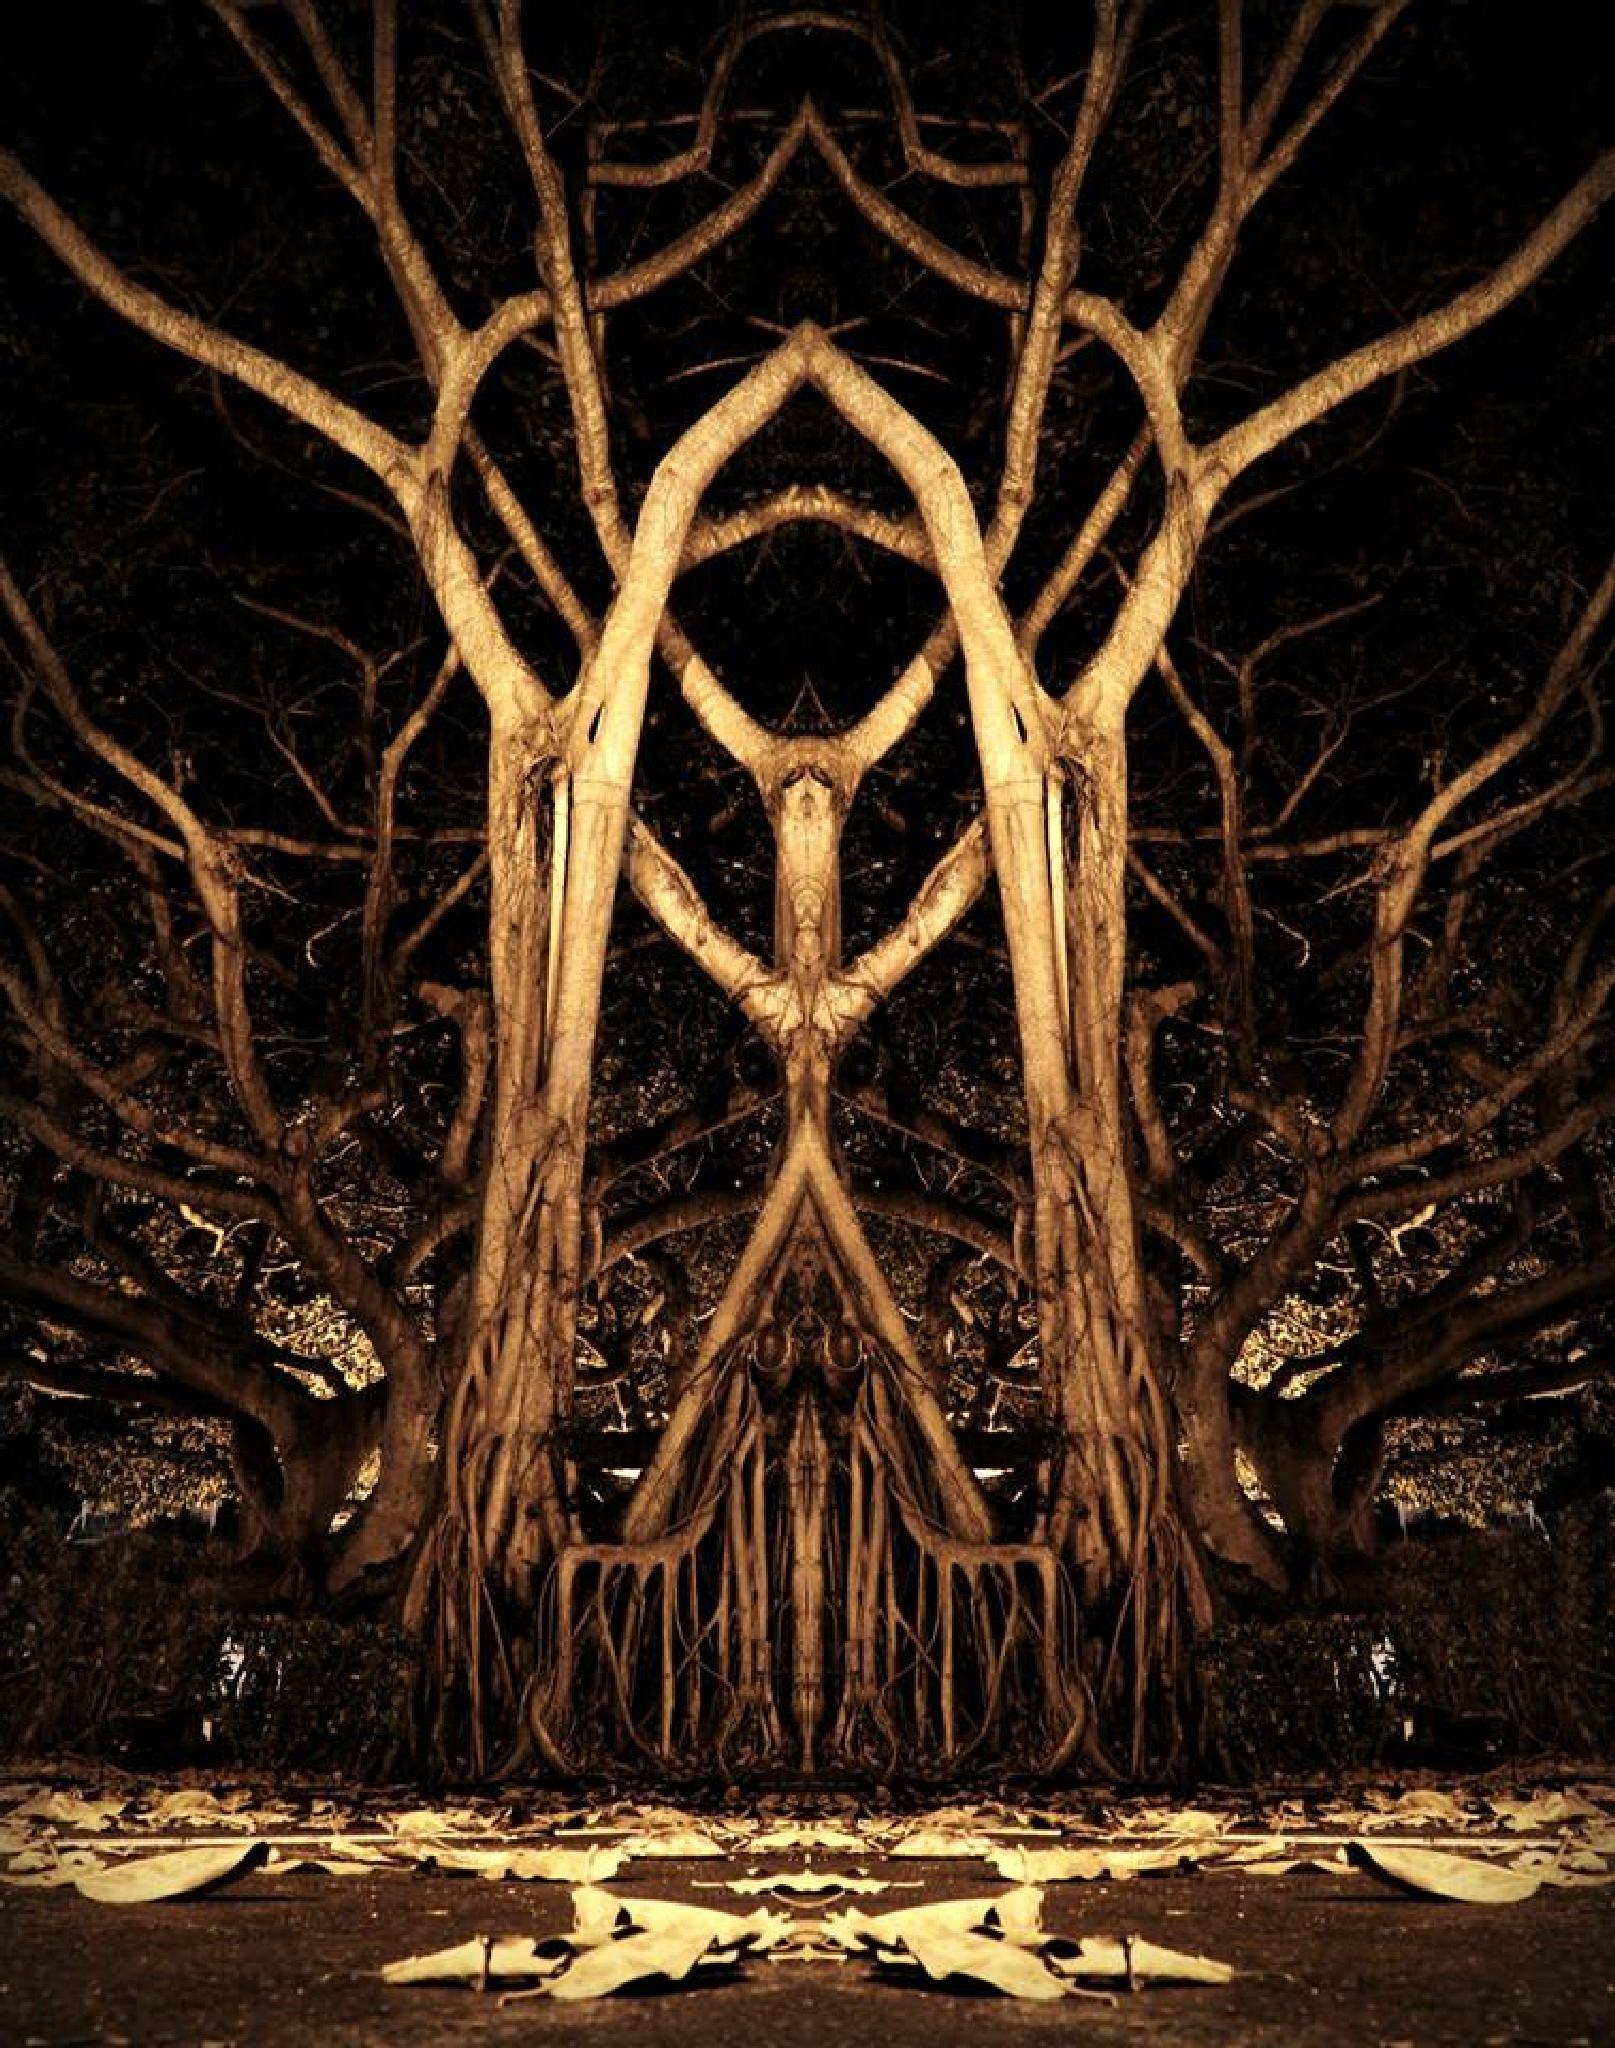 Evil tree by dennis.glisson